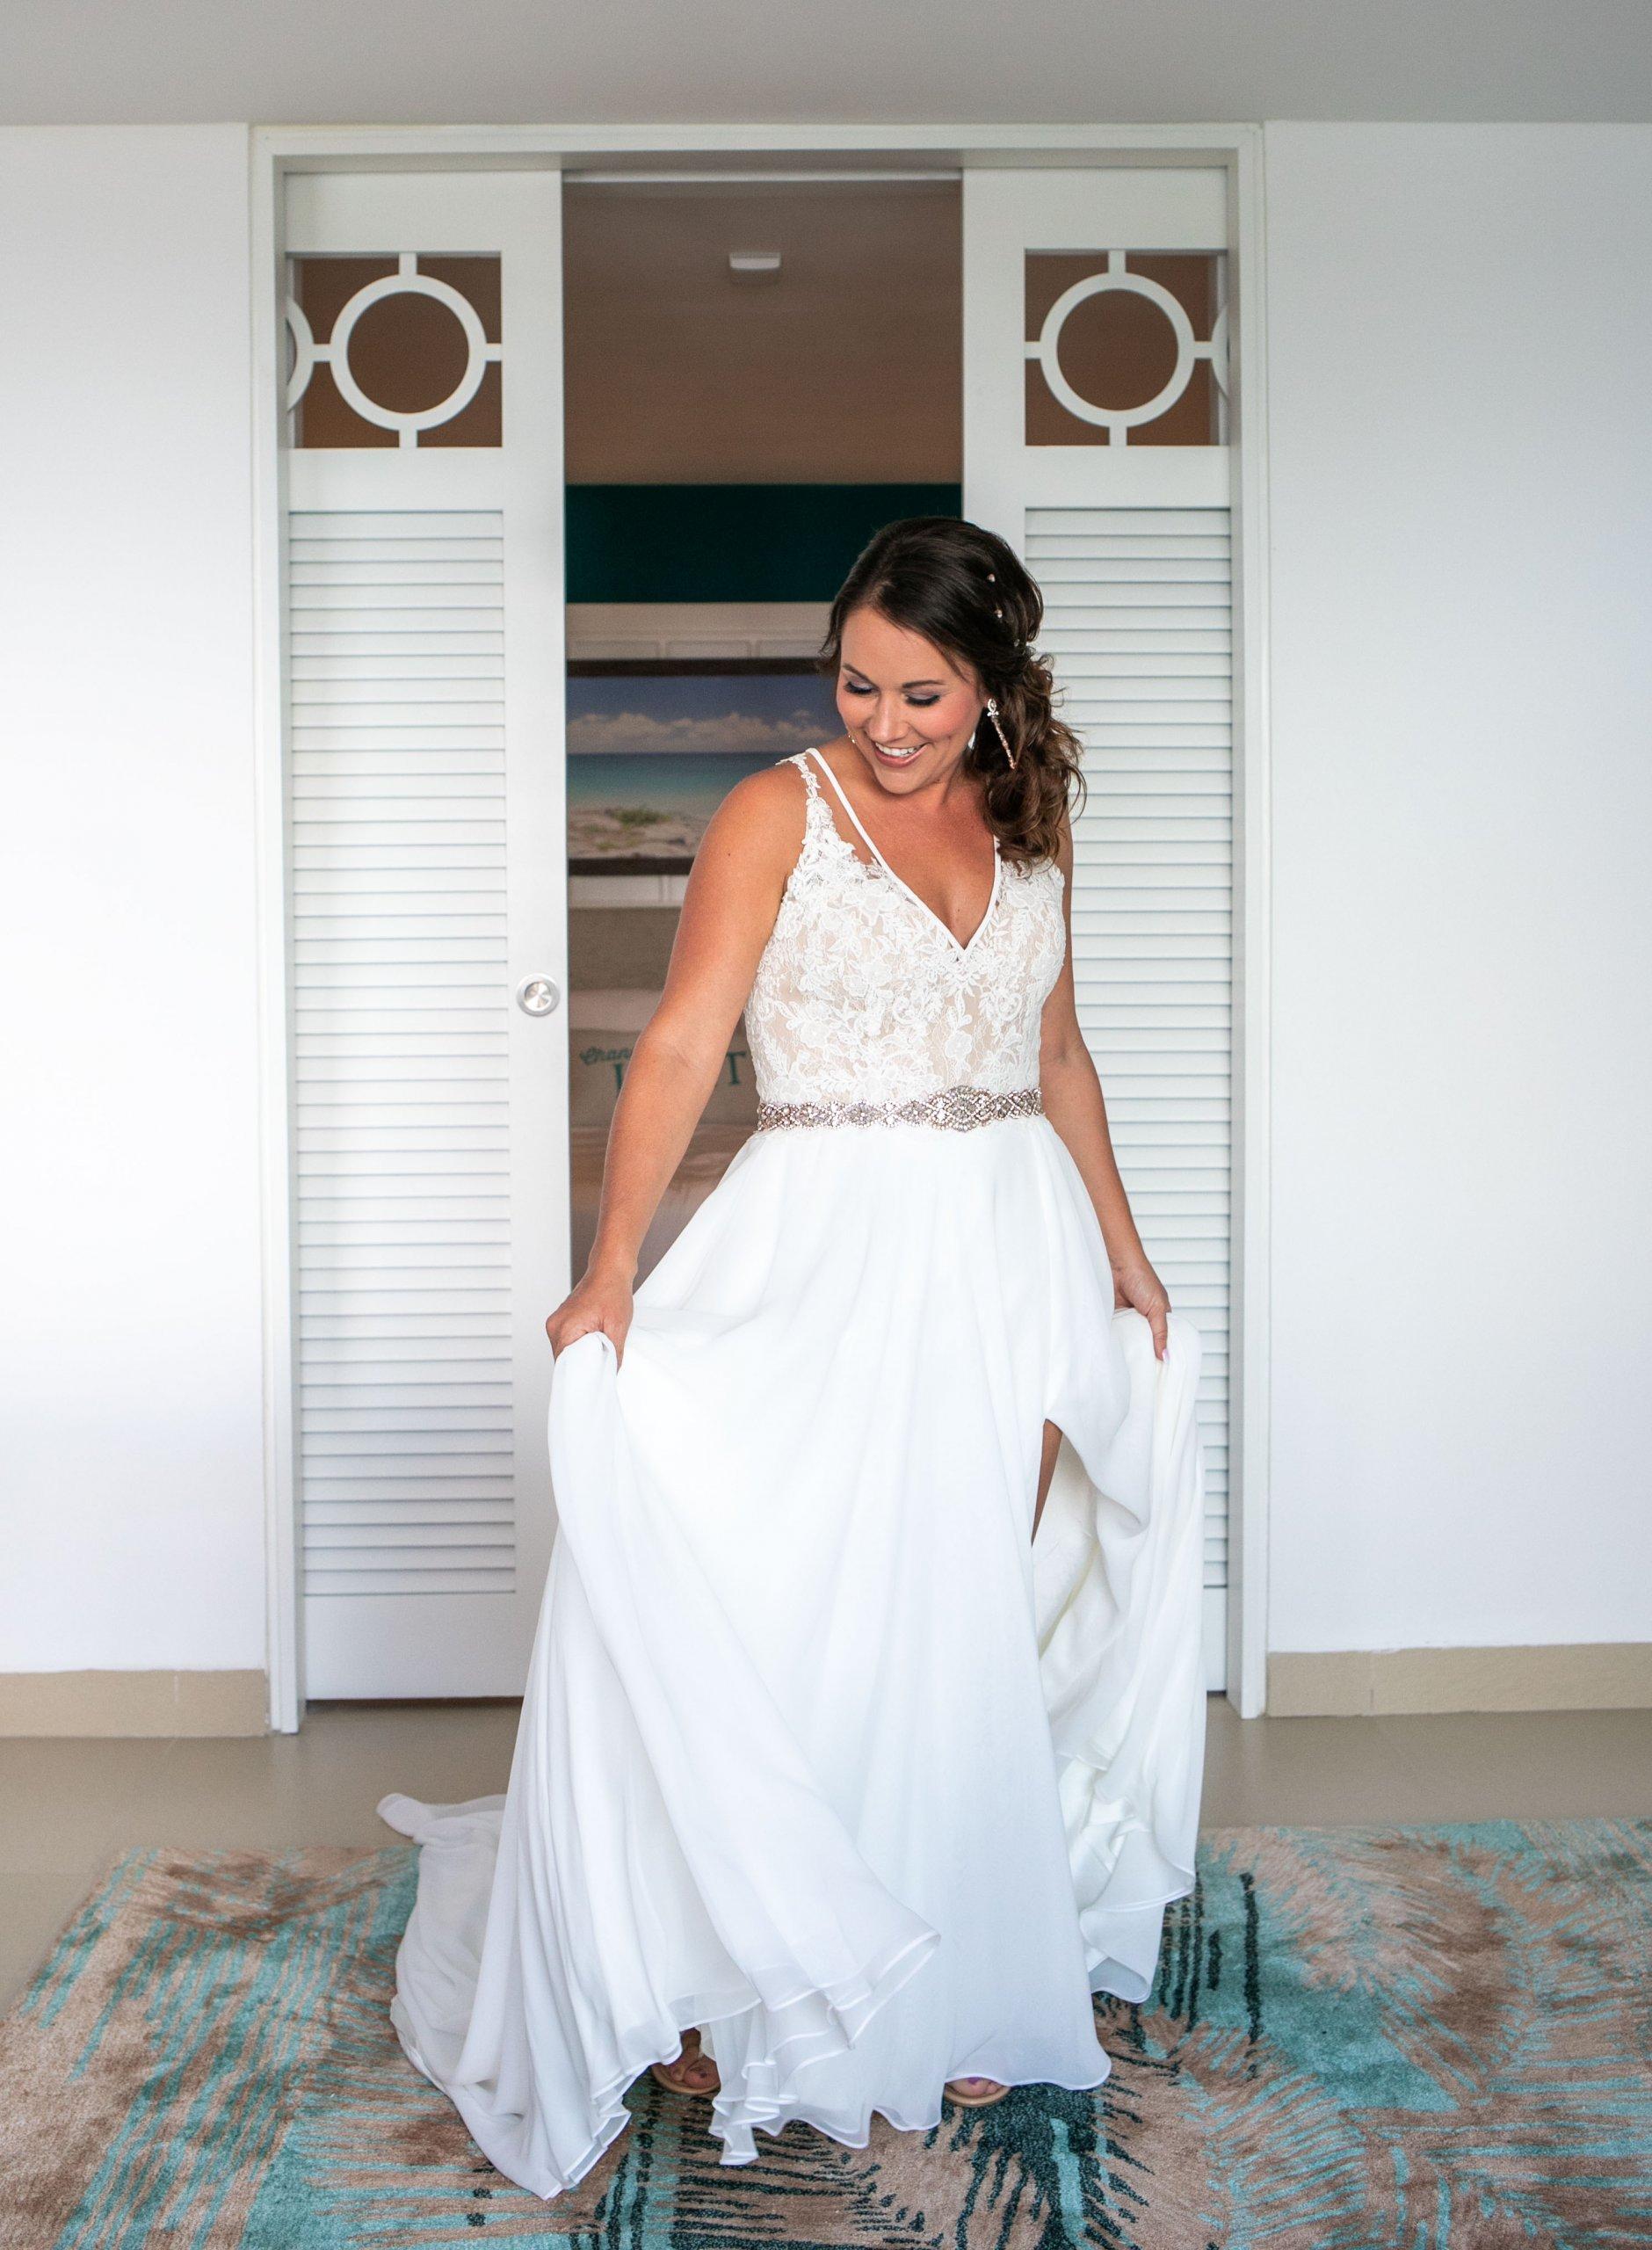 Beth Rob Margaritaville Island Reserve Riviera Cancun Wedding 13 scaled - Beth & Rob - Margaritaville Island Reserve